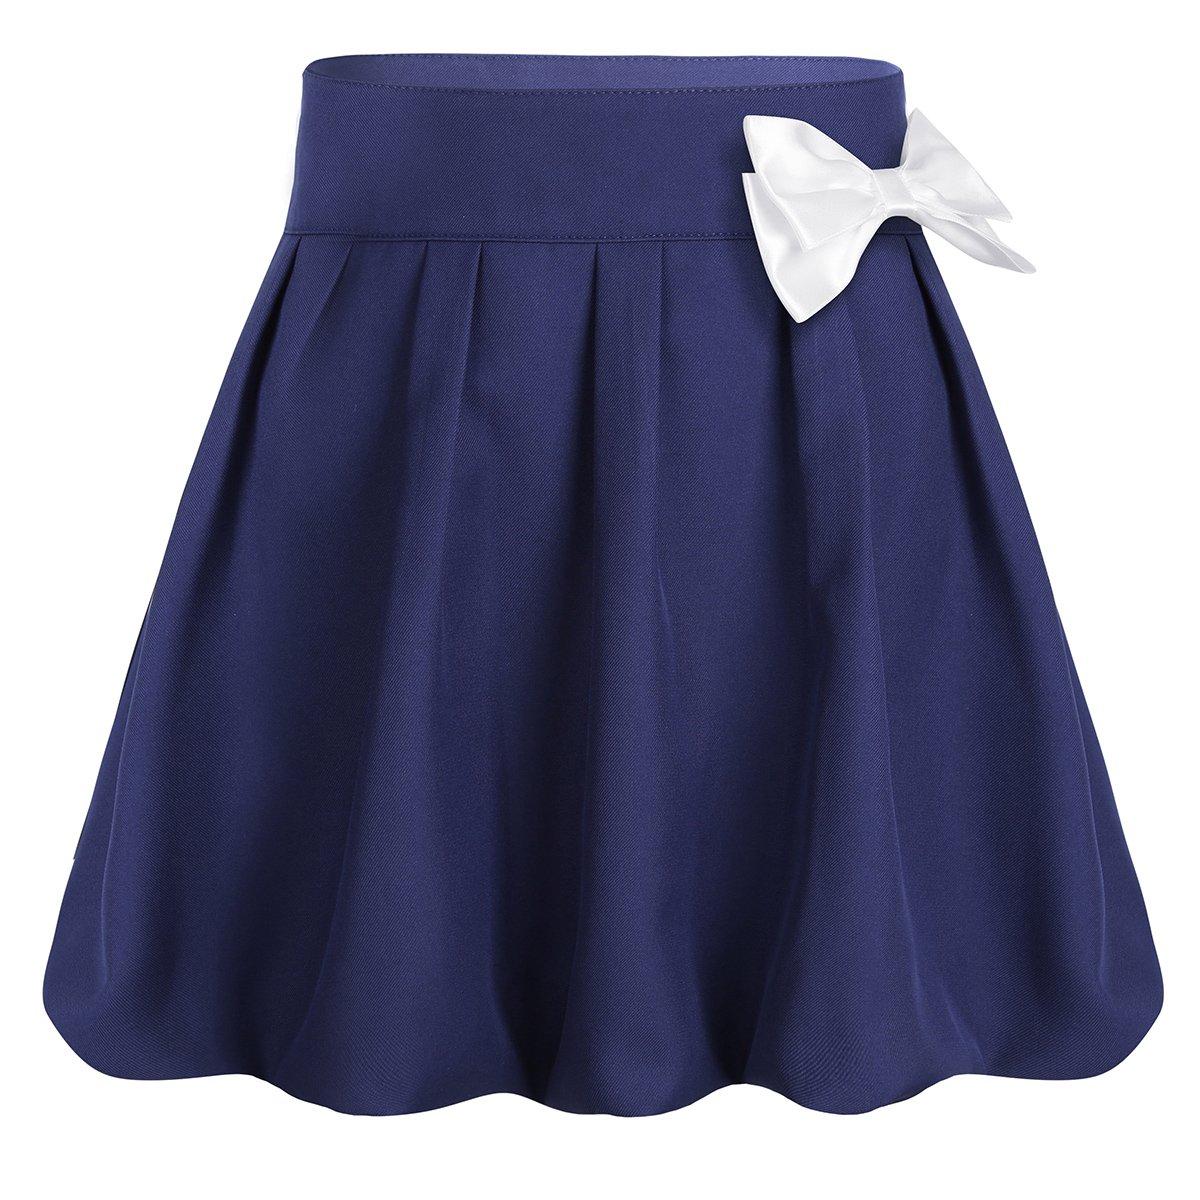 YiZYiF Kids Girls Elastic Soft Plain Uniform Pleated Skirt with Hidden Shorts Schoolwear Navy Blue 6